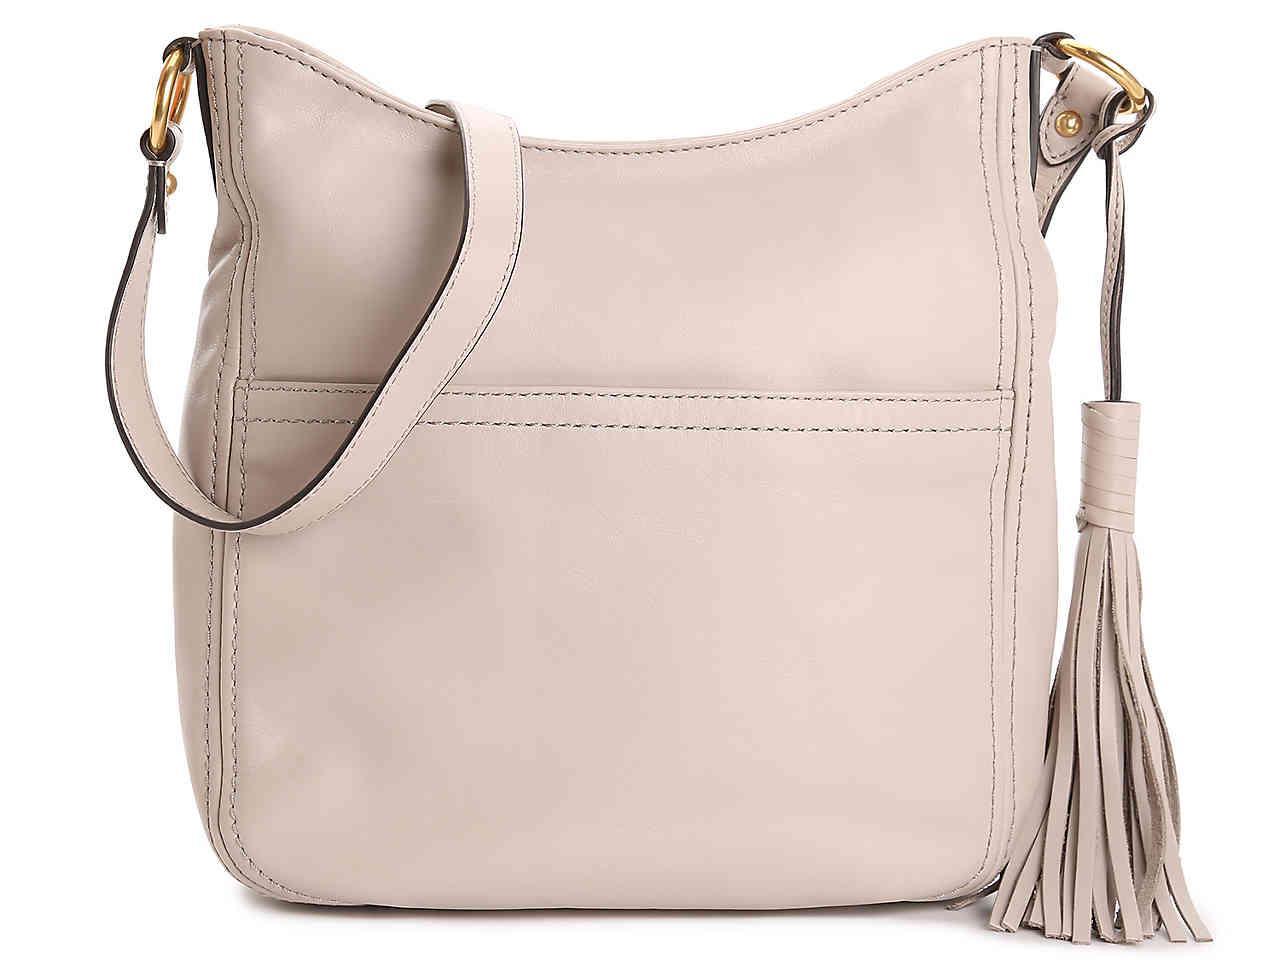 33b99bf720 Lyst - Cole Haan Gabriella Leather Crossbody Bag in Gray